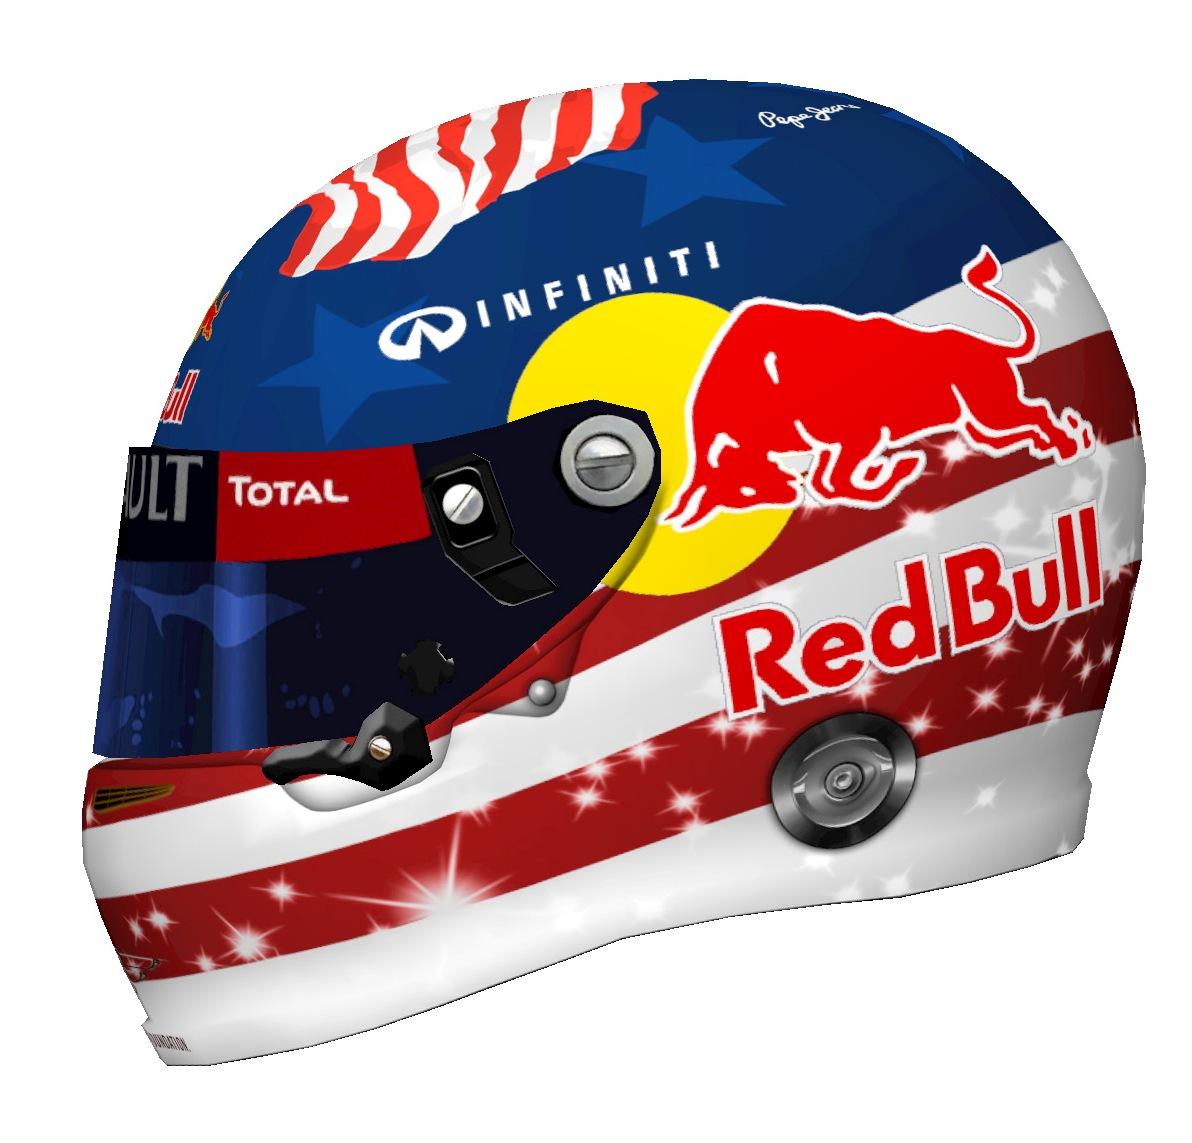 American Red Bull Helmet Template.jpg